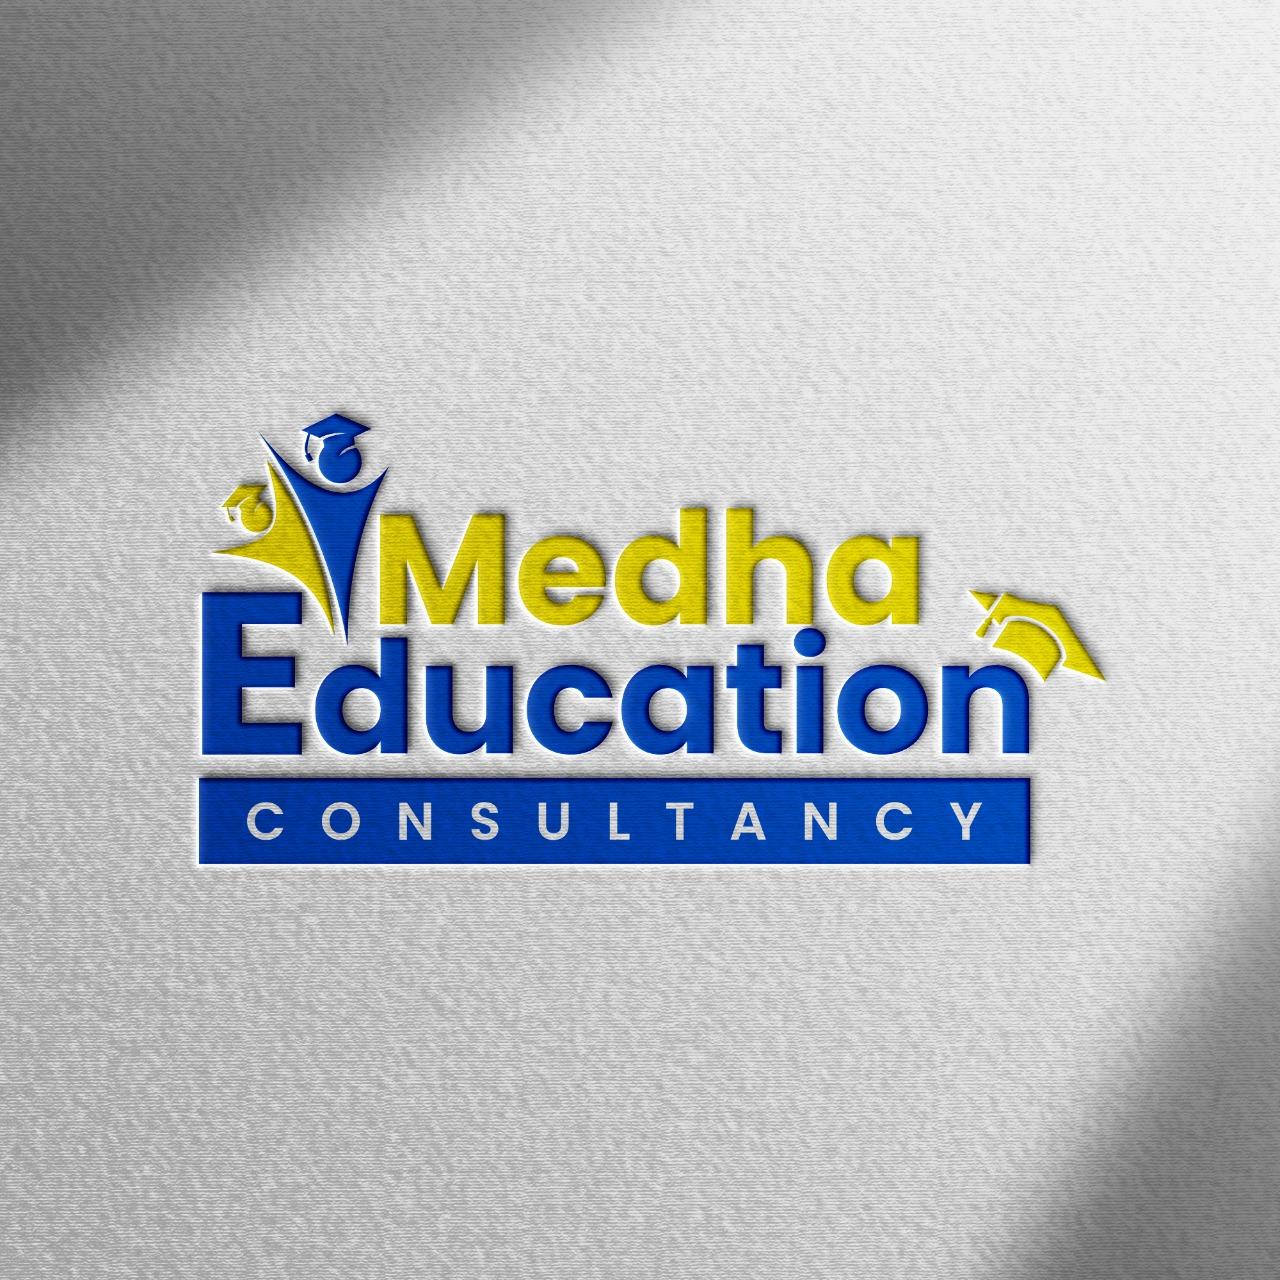 Logo Design Services for Medha Education Consultancy